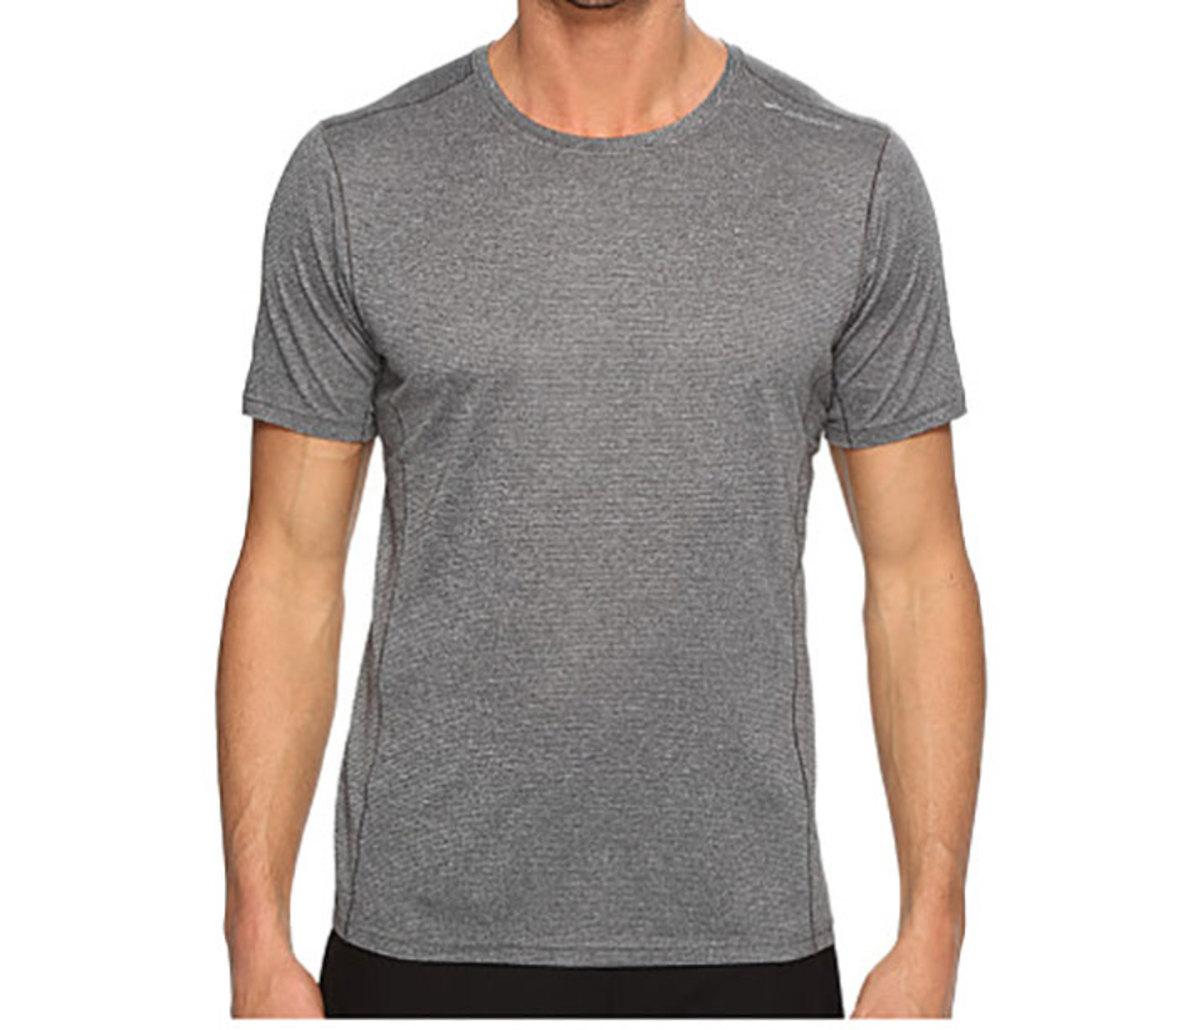 brooks-ghost-running-shirt.jpg